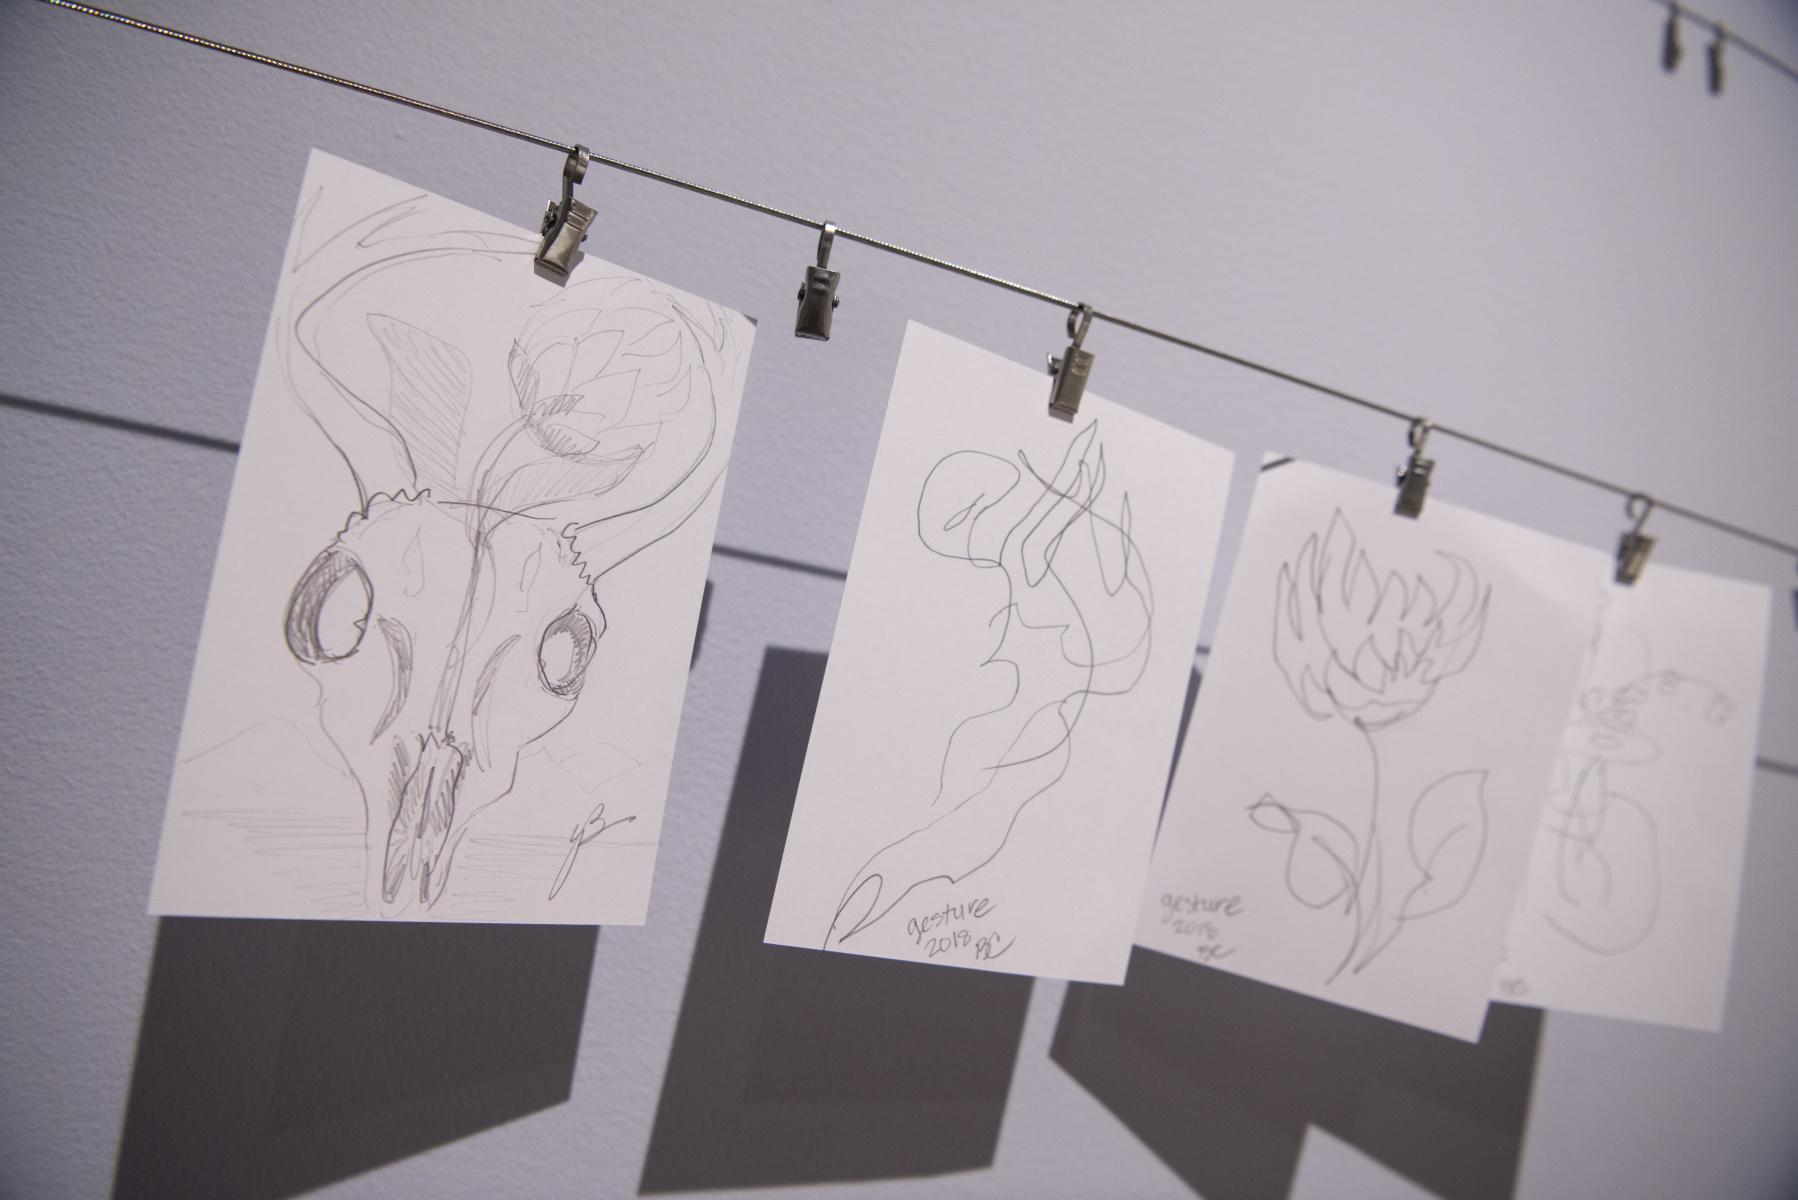 Visitor drawings.